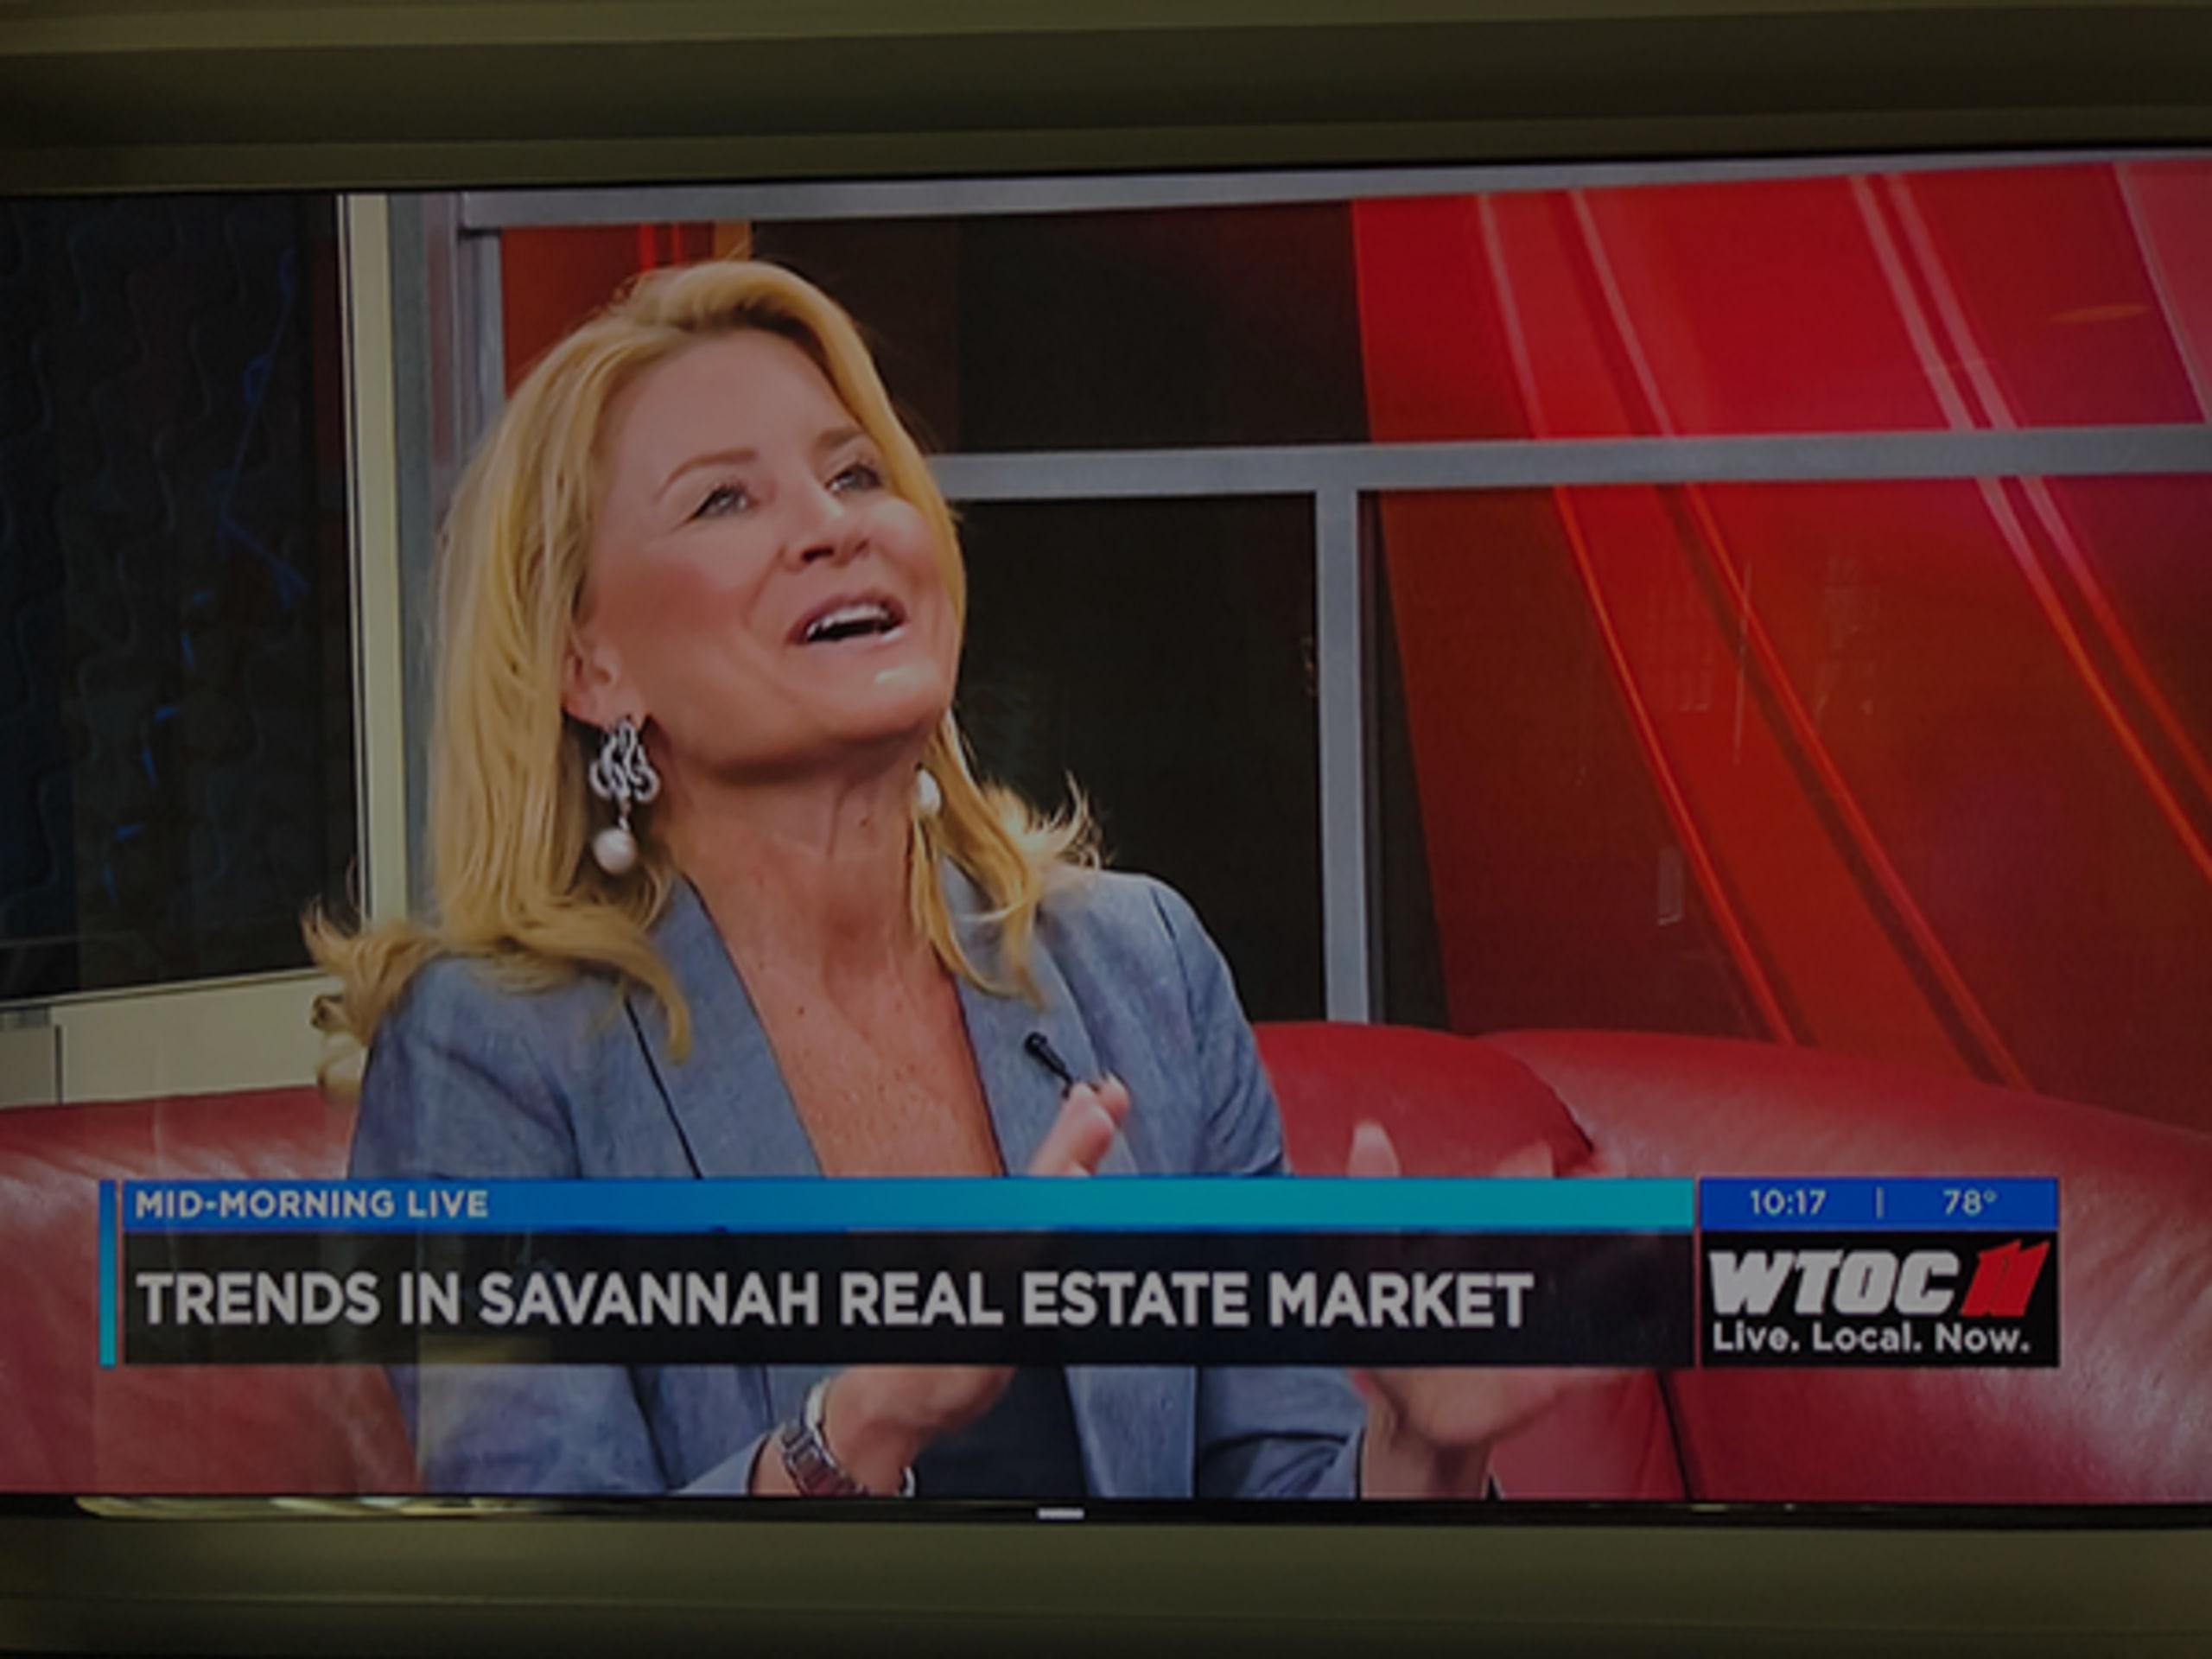 Savannah Real Estate Trends